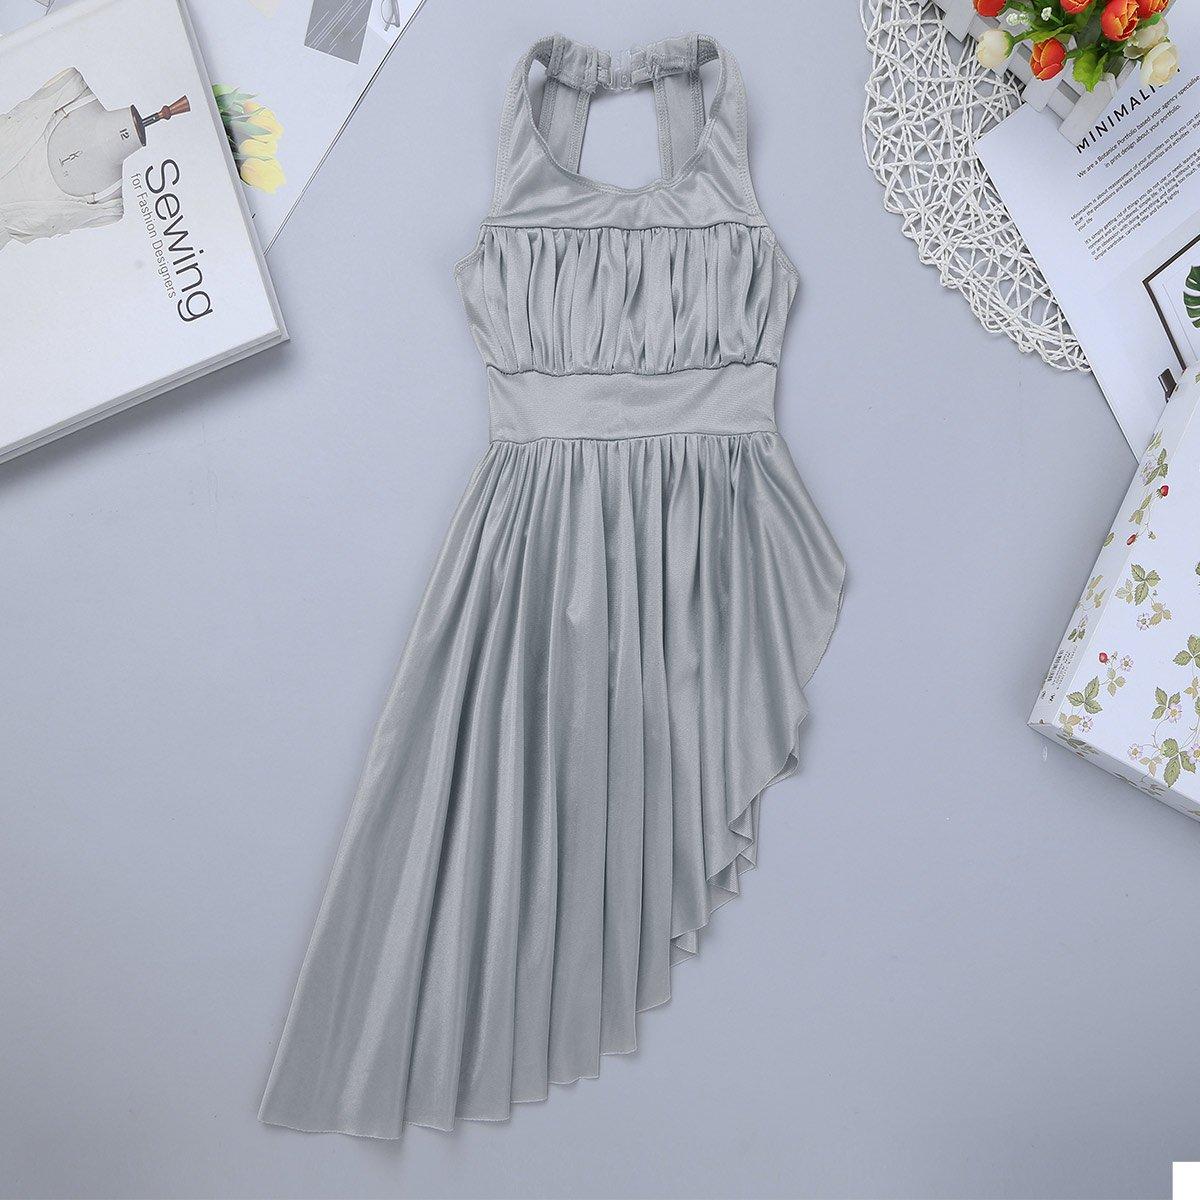 CHICTRY Kids Girls Lyrical Dance Dress Criss-Cross Back Irregular High-Low Skirt Ballroom Dancing Costumes